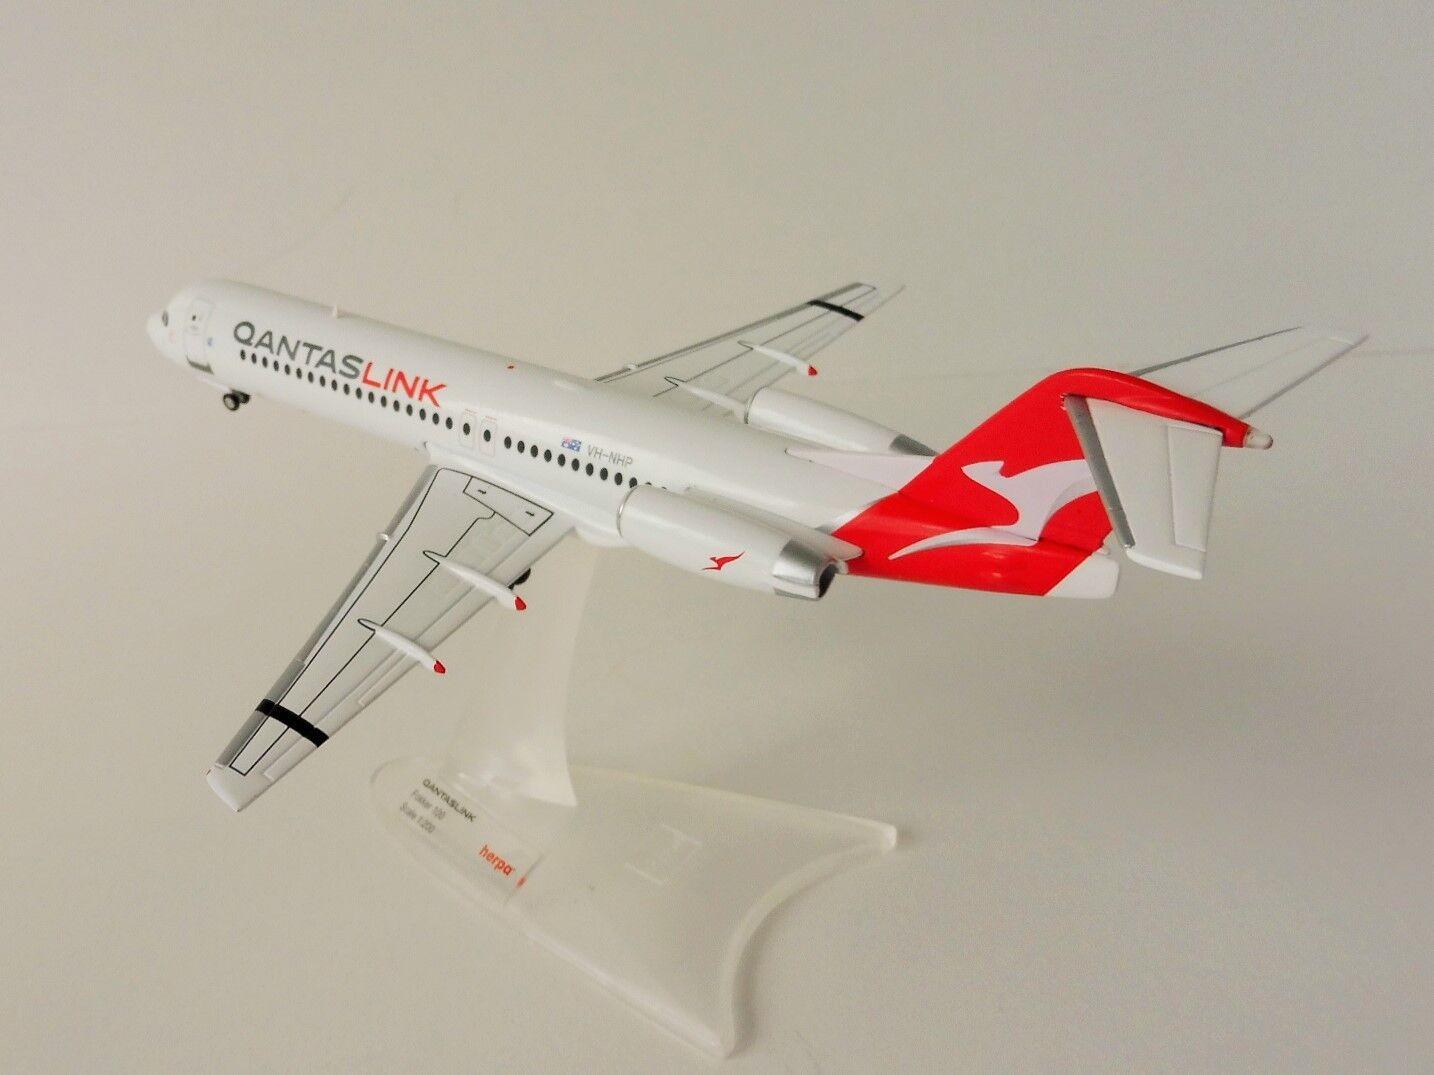 Fokker 100 Qantaslink 1 200 Herpa 559096 Qantas Link Australia f100